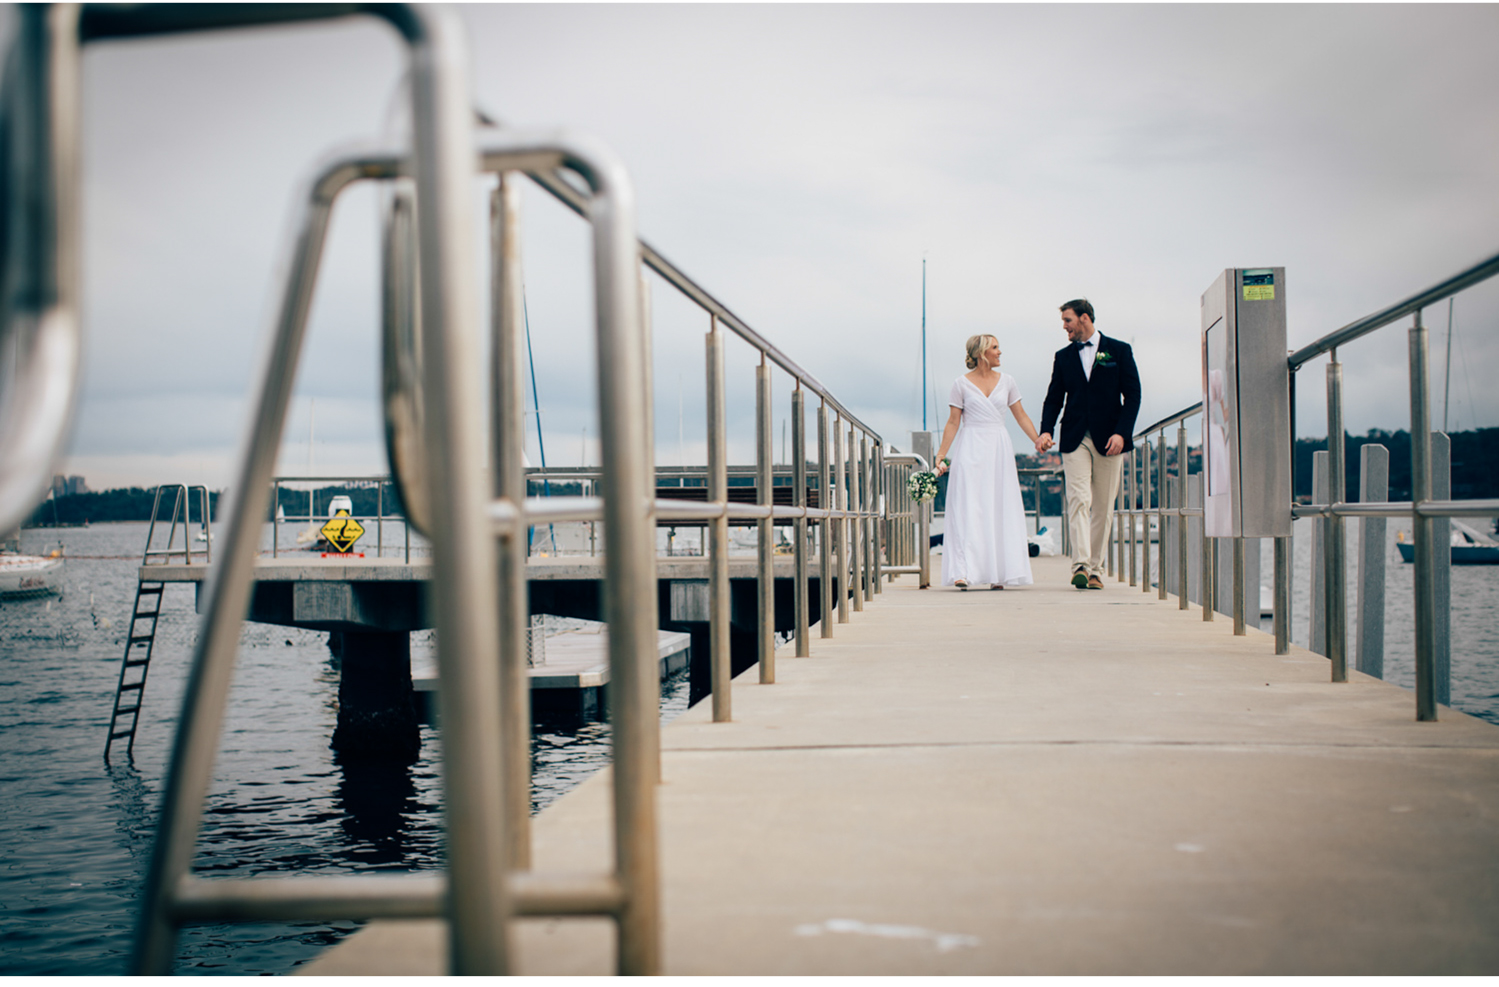 sheridan_nilsson_watsons_bay_wedding.33.jpg